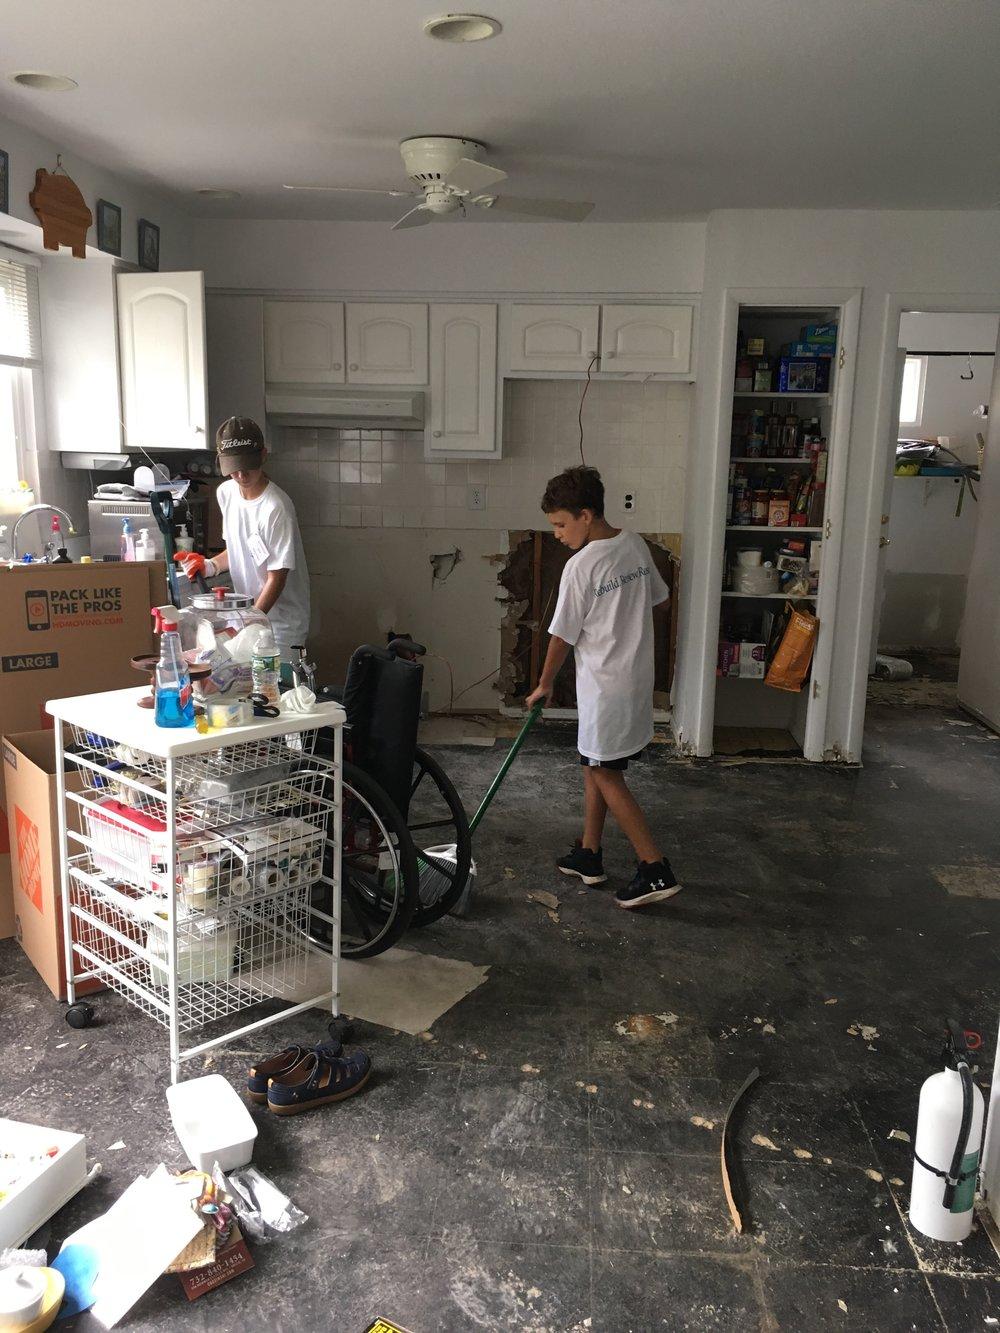 Volunteers sweep the floor after most of the debris has been removed.